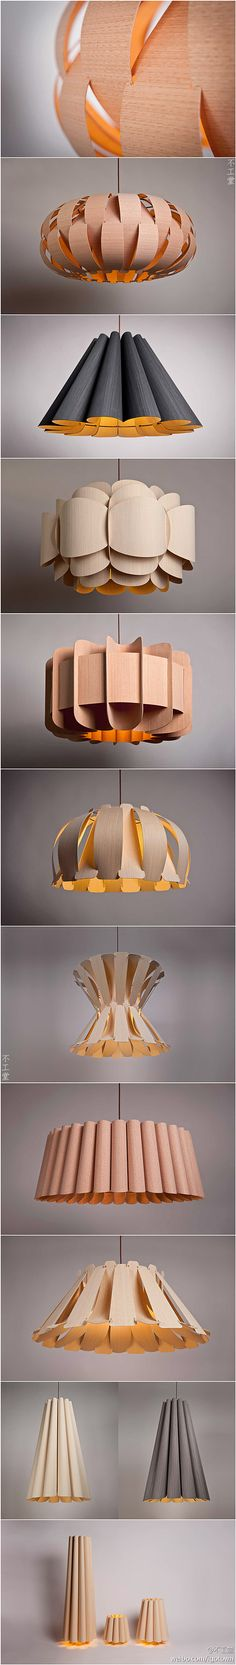 Kitchen Light Shades